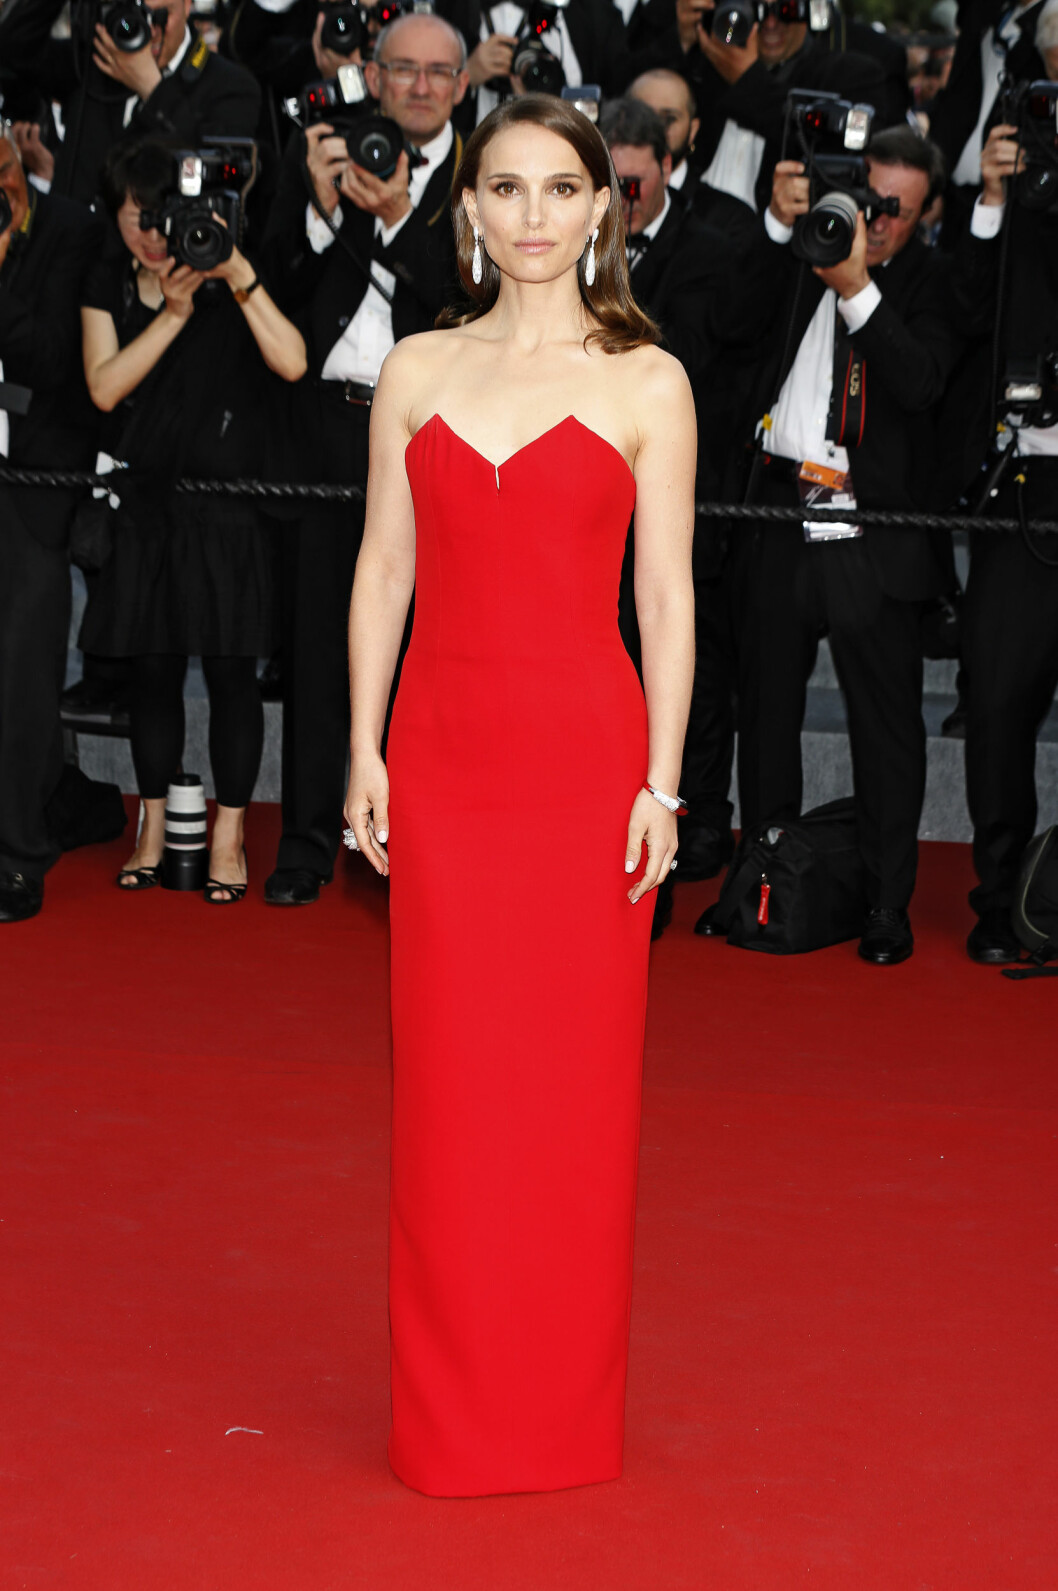 RØDT: Natalie Portman i kjole fra Dior. Foto: DPA Scanpix